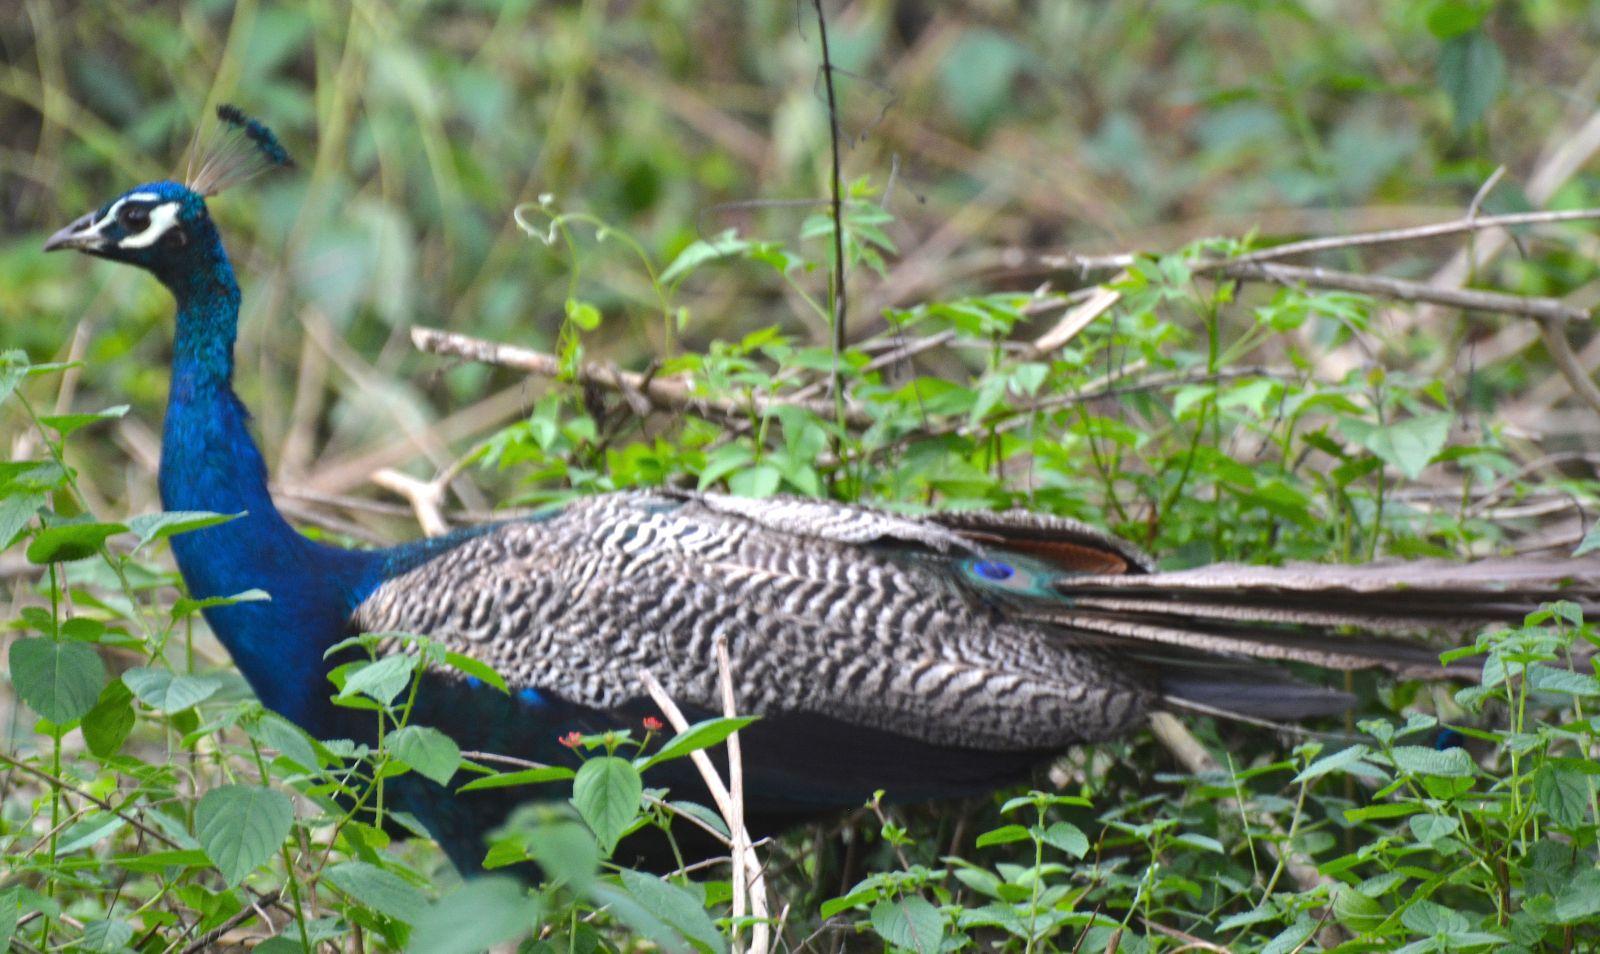 peacock-nagarahole-national-park